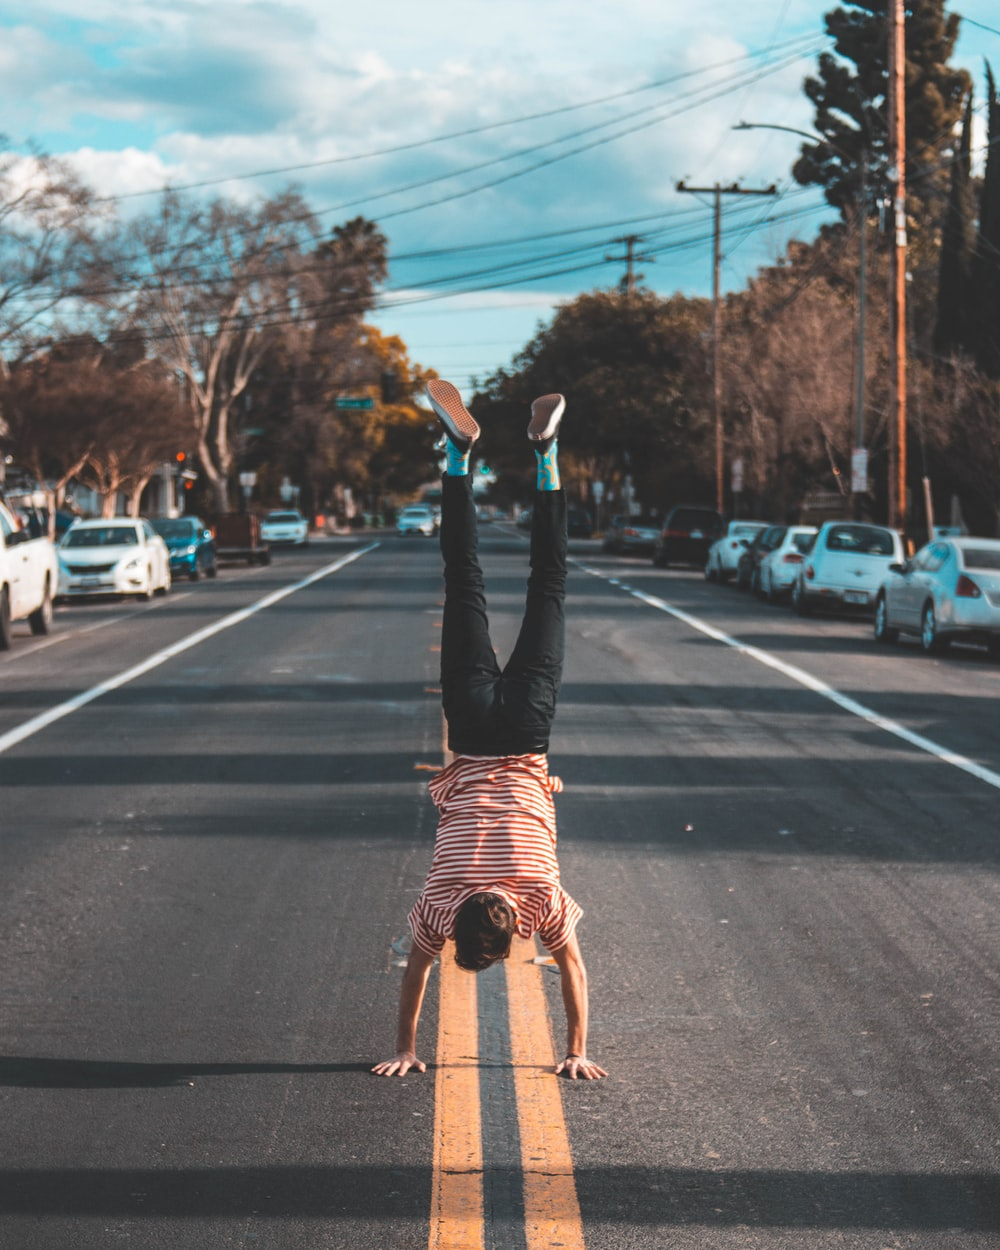 man doing hands stand on asphalt road between trees